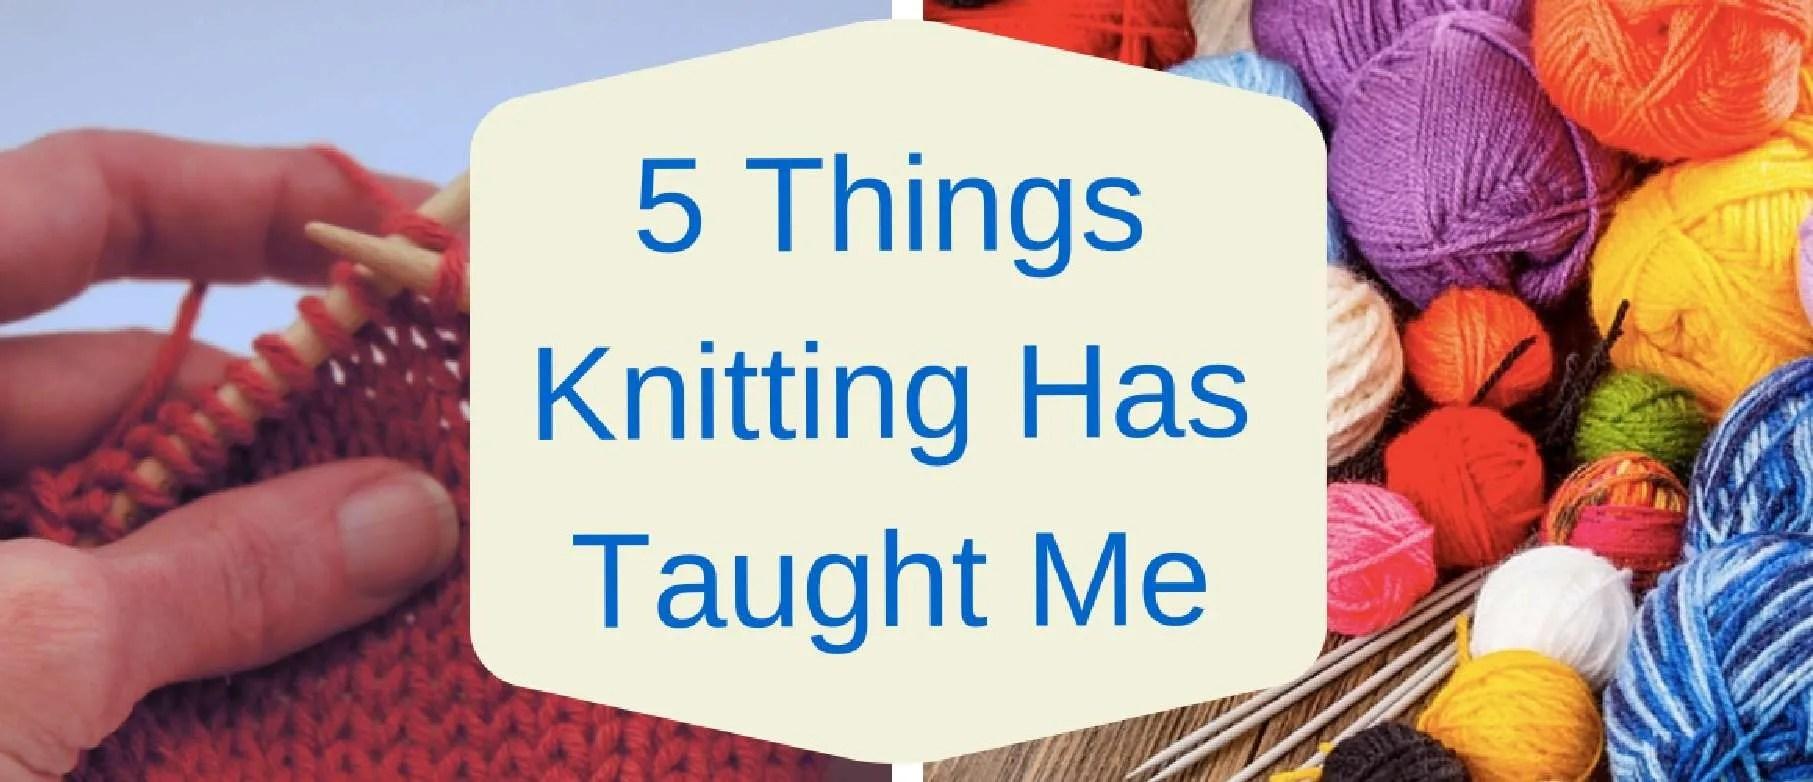 5 Things Knitting Has Taught Me